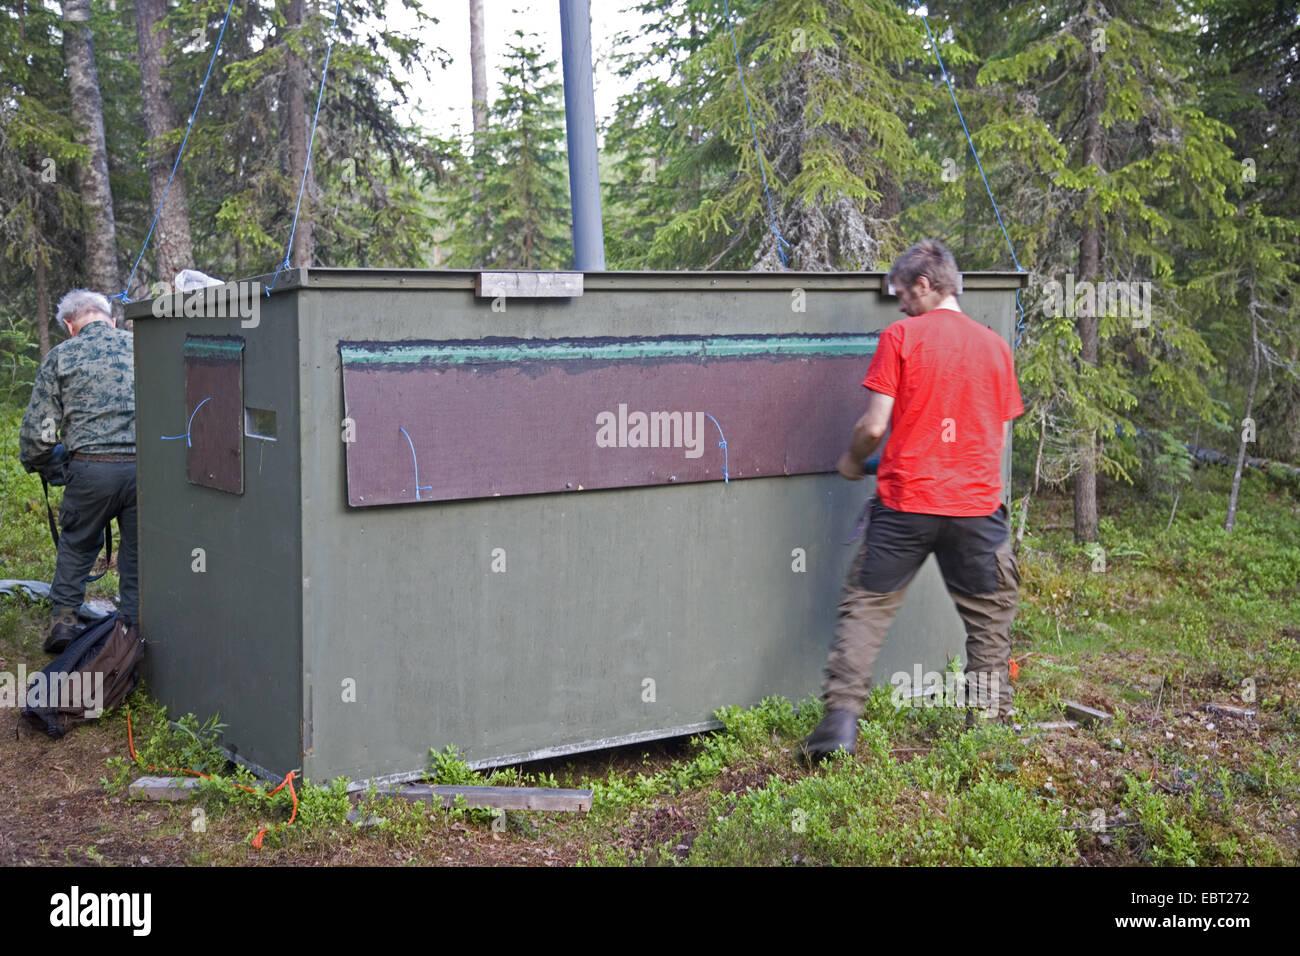 tragen Sie Anleitung Sicherung Foto ausblenden, um Bären, Finnland, Martinselkonen Wildnis Zentrum ausschließen Stockbild